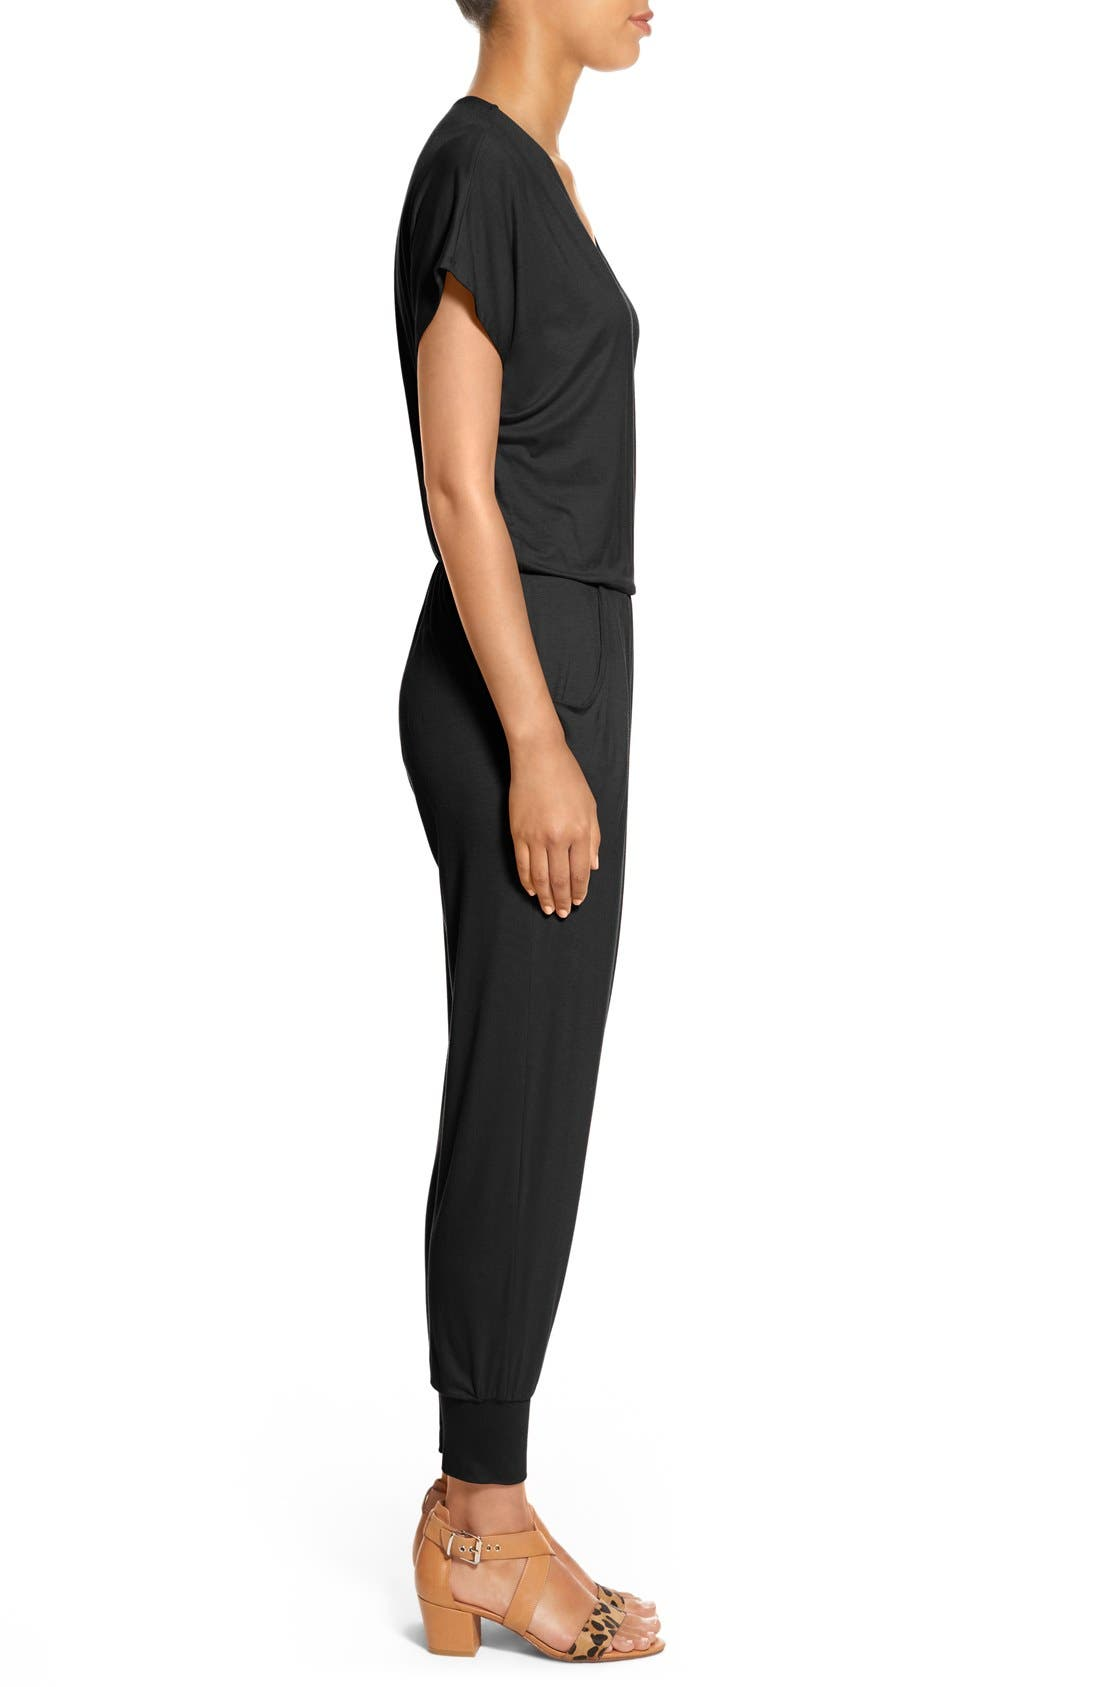 LOVEAPPELLA, Short Sleeve Wrap Top Jumpsuit, Alternate thumbnail 5, color, BLACK